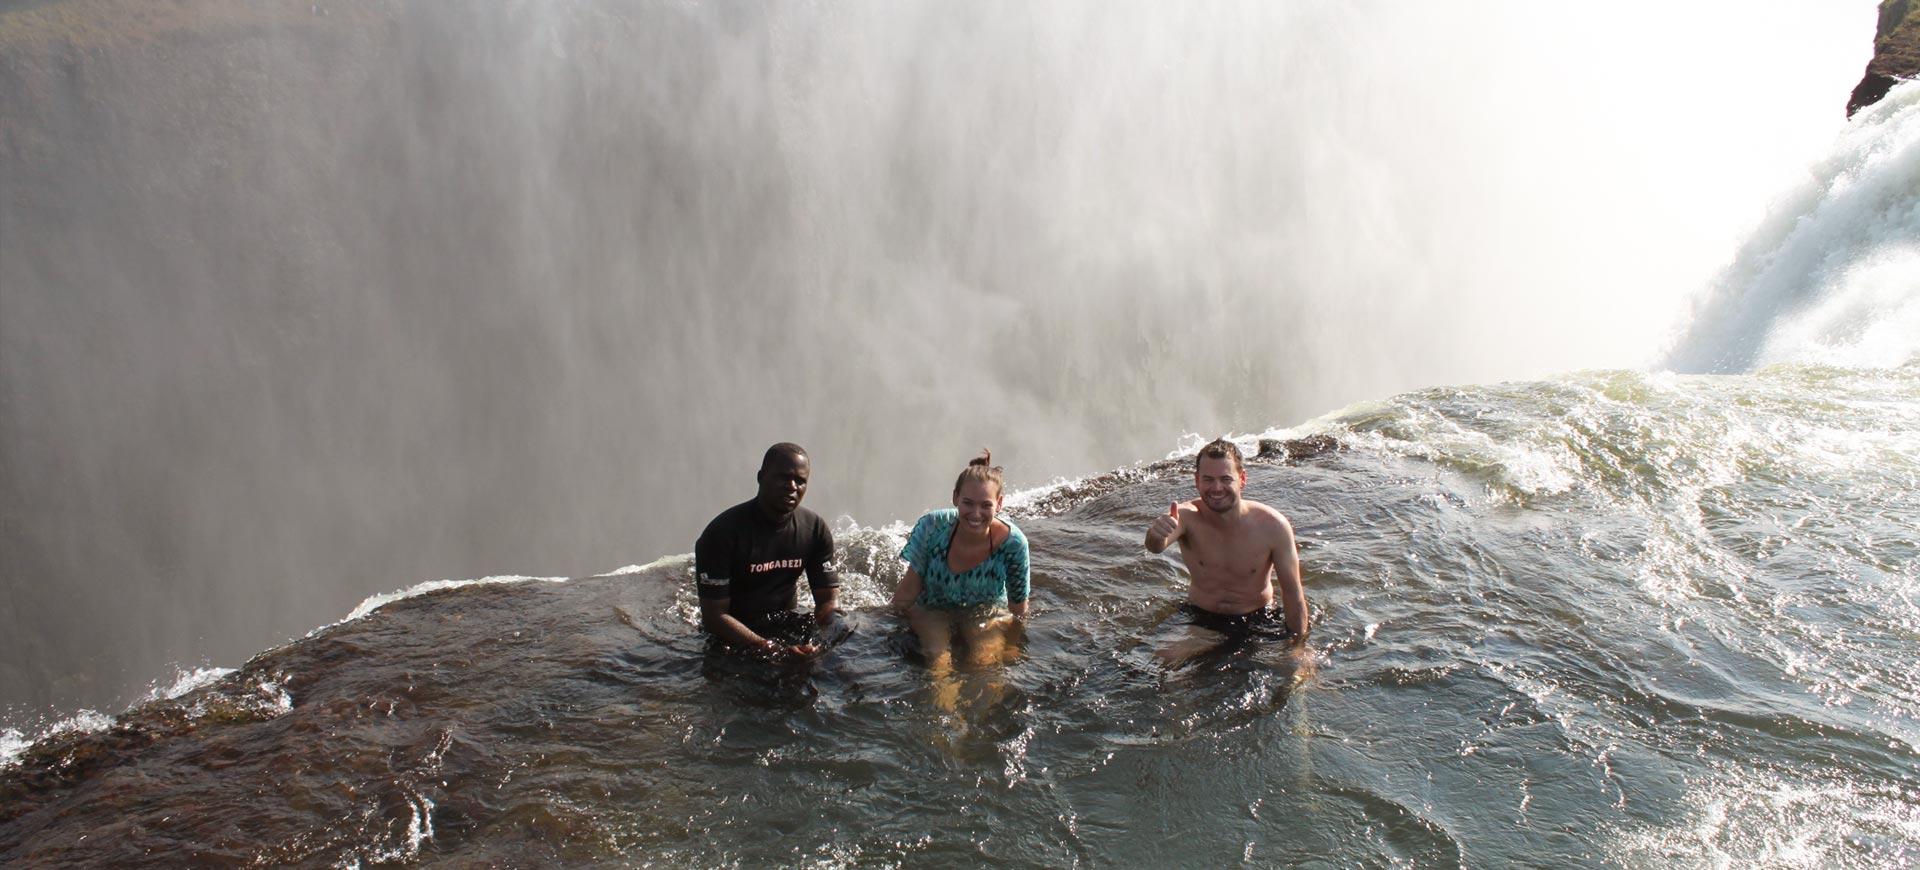 devil's pool victoria falls | livingstone island tour | visit